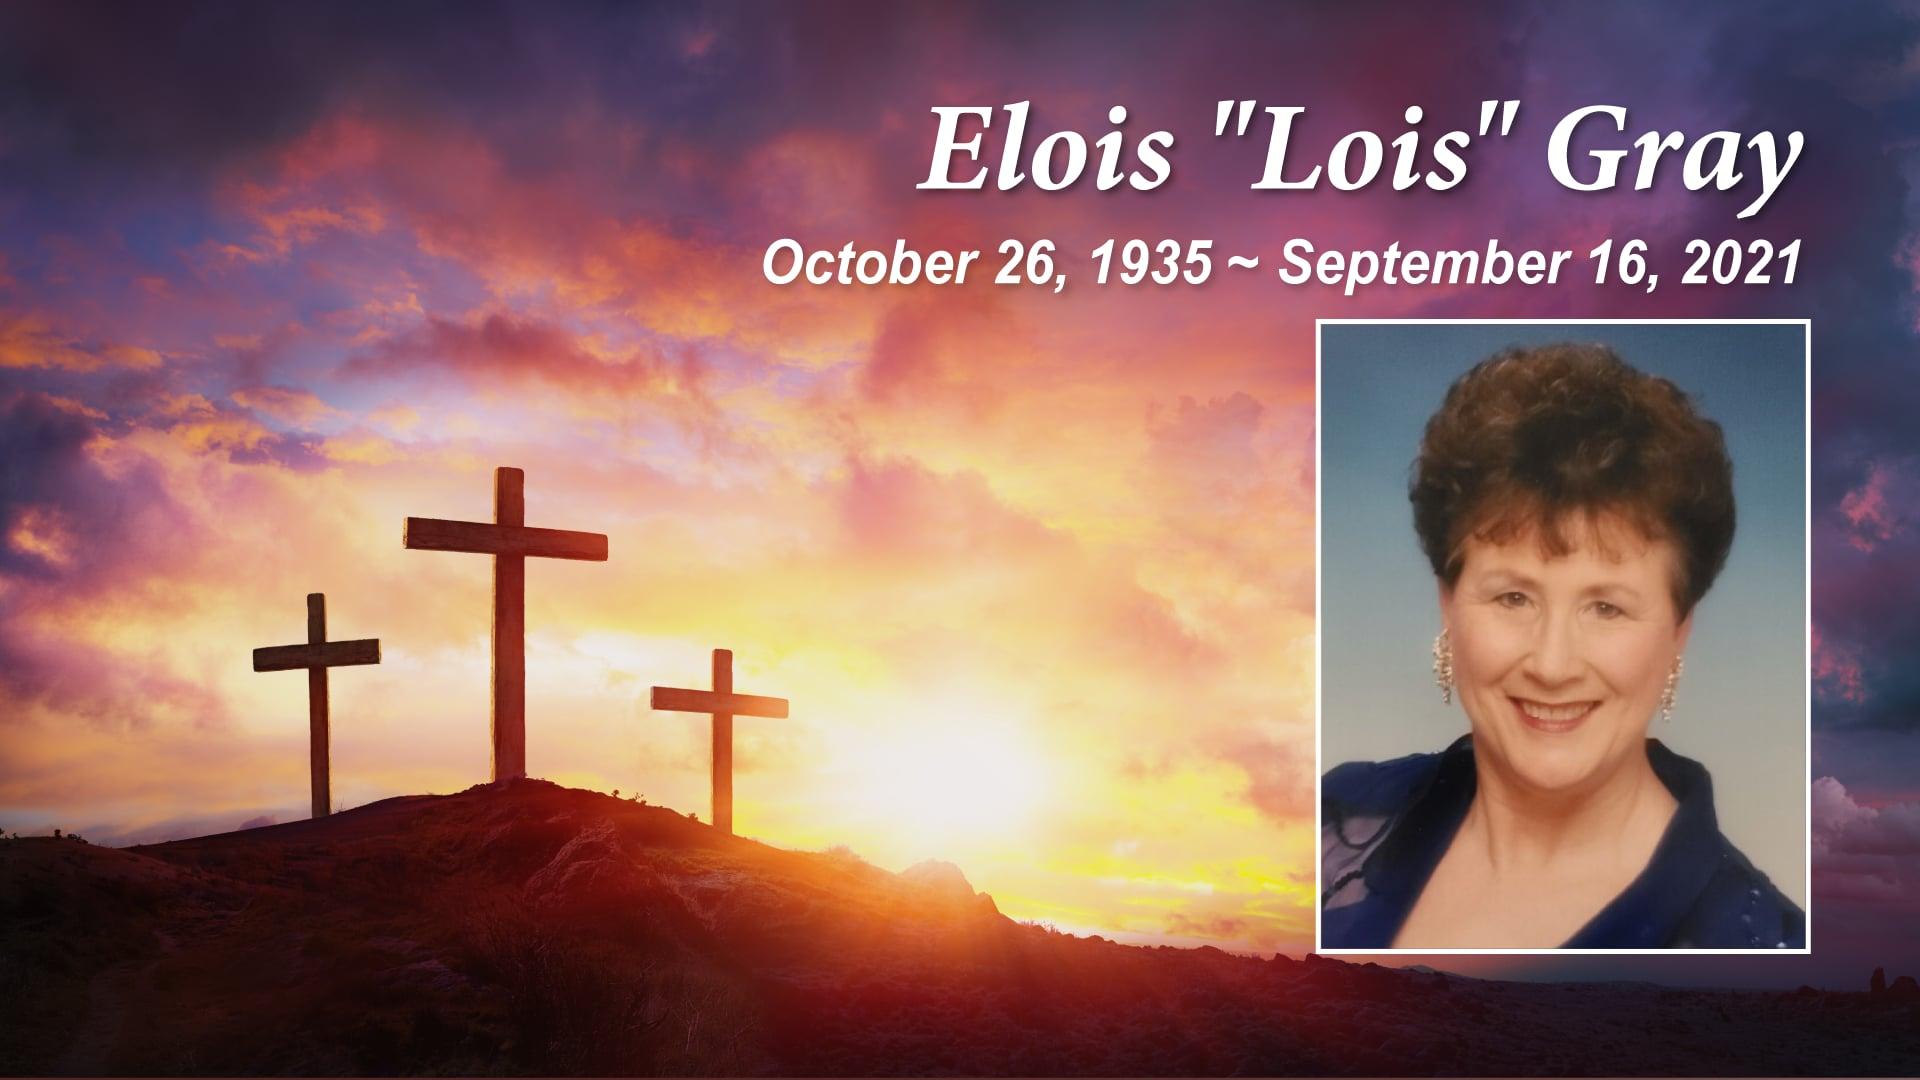 Memorial Service for Elois Gray, September 28th, 10:00 am